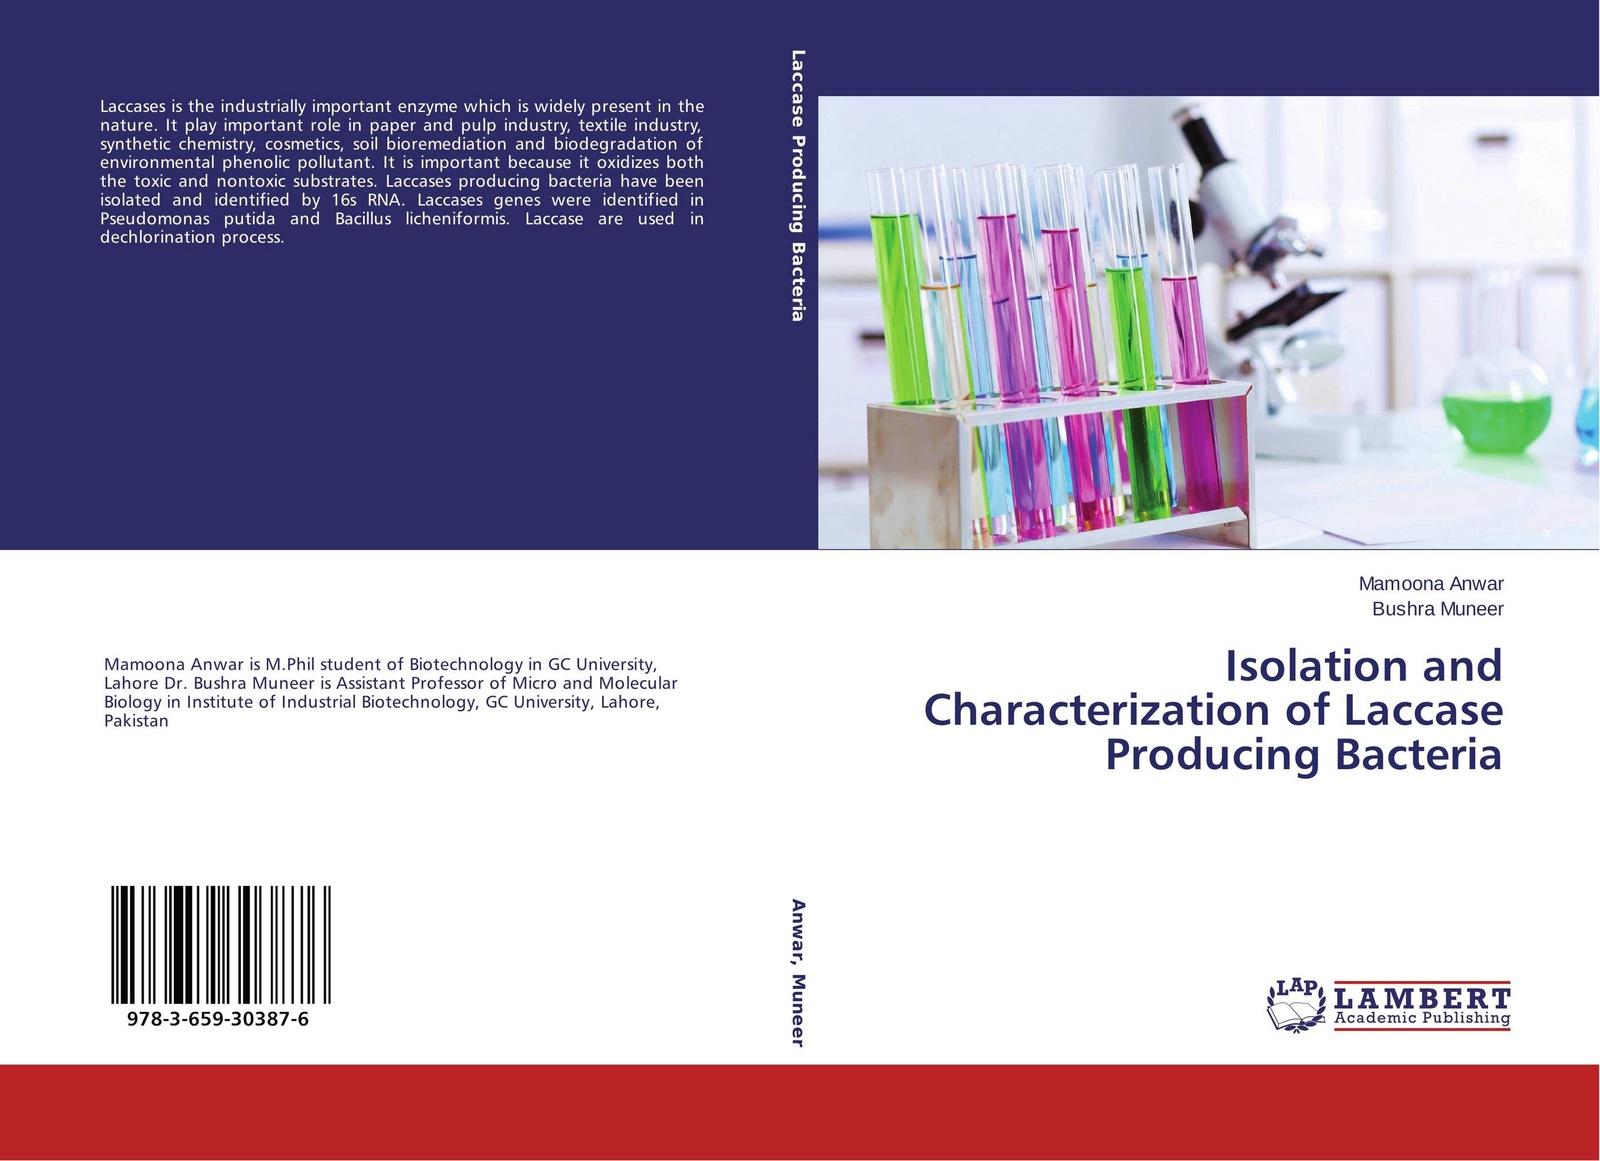 Mamoona Anwar and Bushra Muneer Isolation and Characterization of Laccase Producing Bacteria